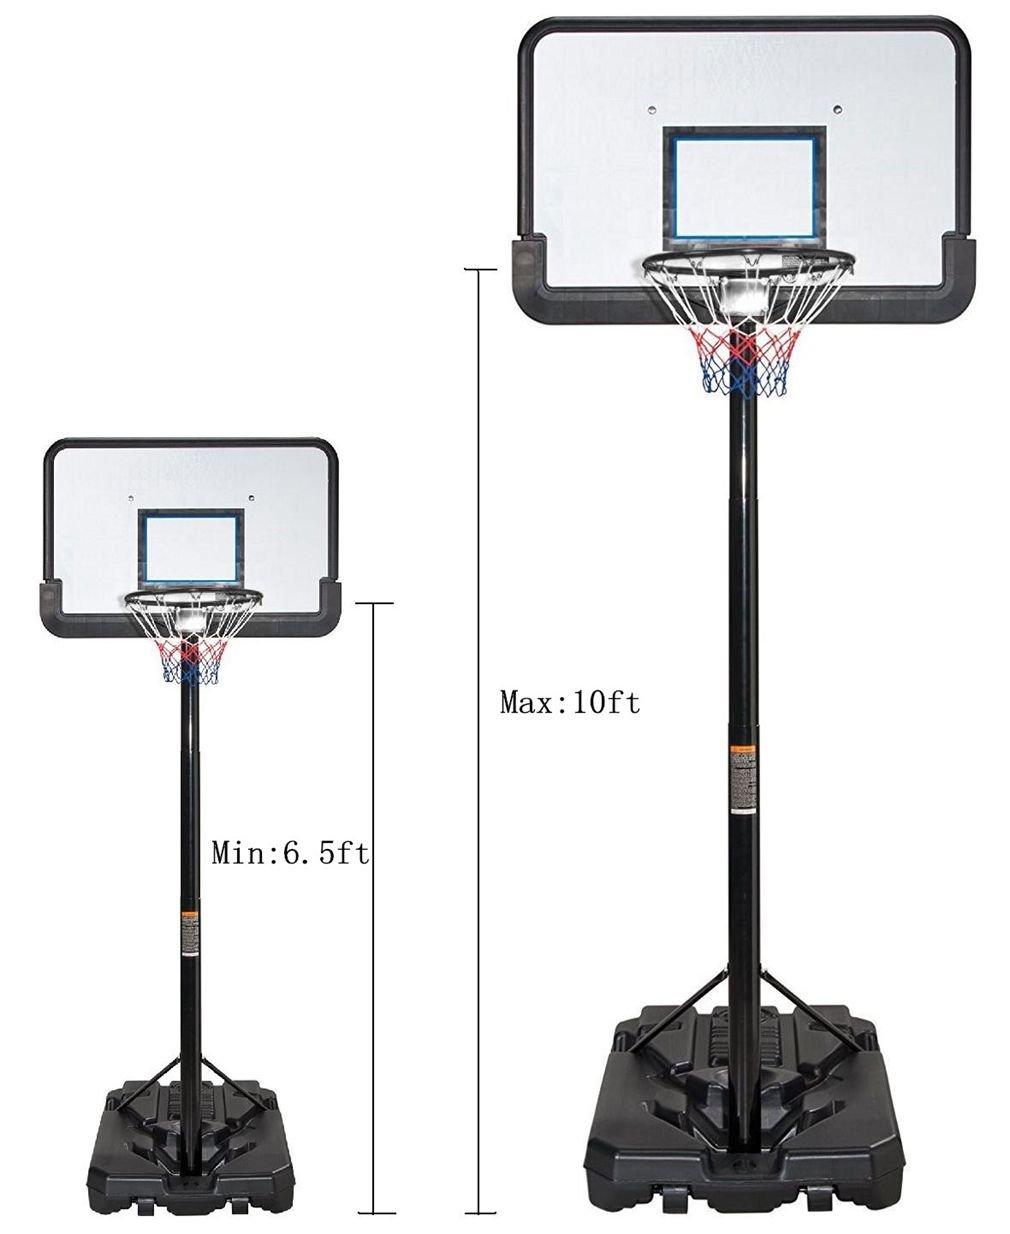 KLB Sport Pro Court Height Adjustable Portable Basketball Hoop System w/Wheels, 43 Inch Backboard (Black Coated) by KLB Sport (Image #2)